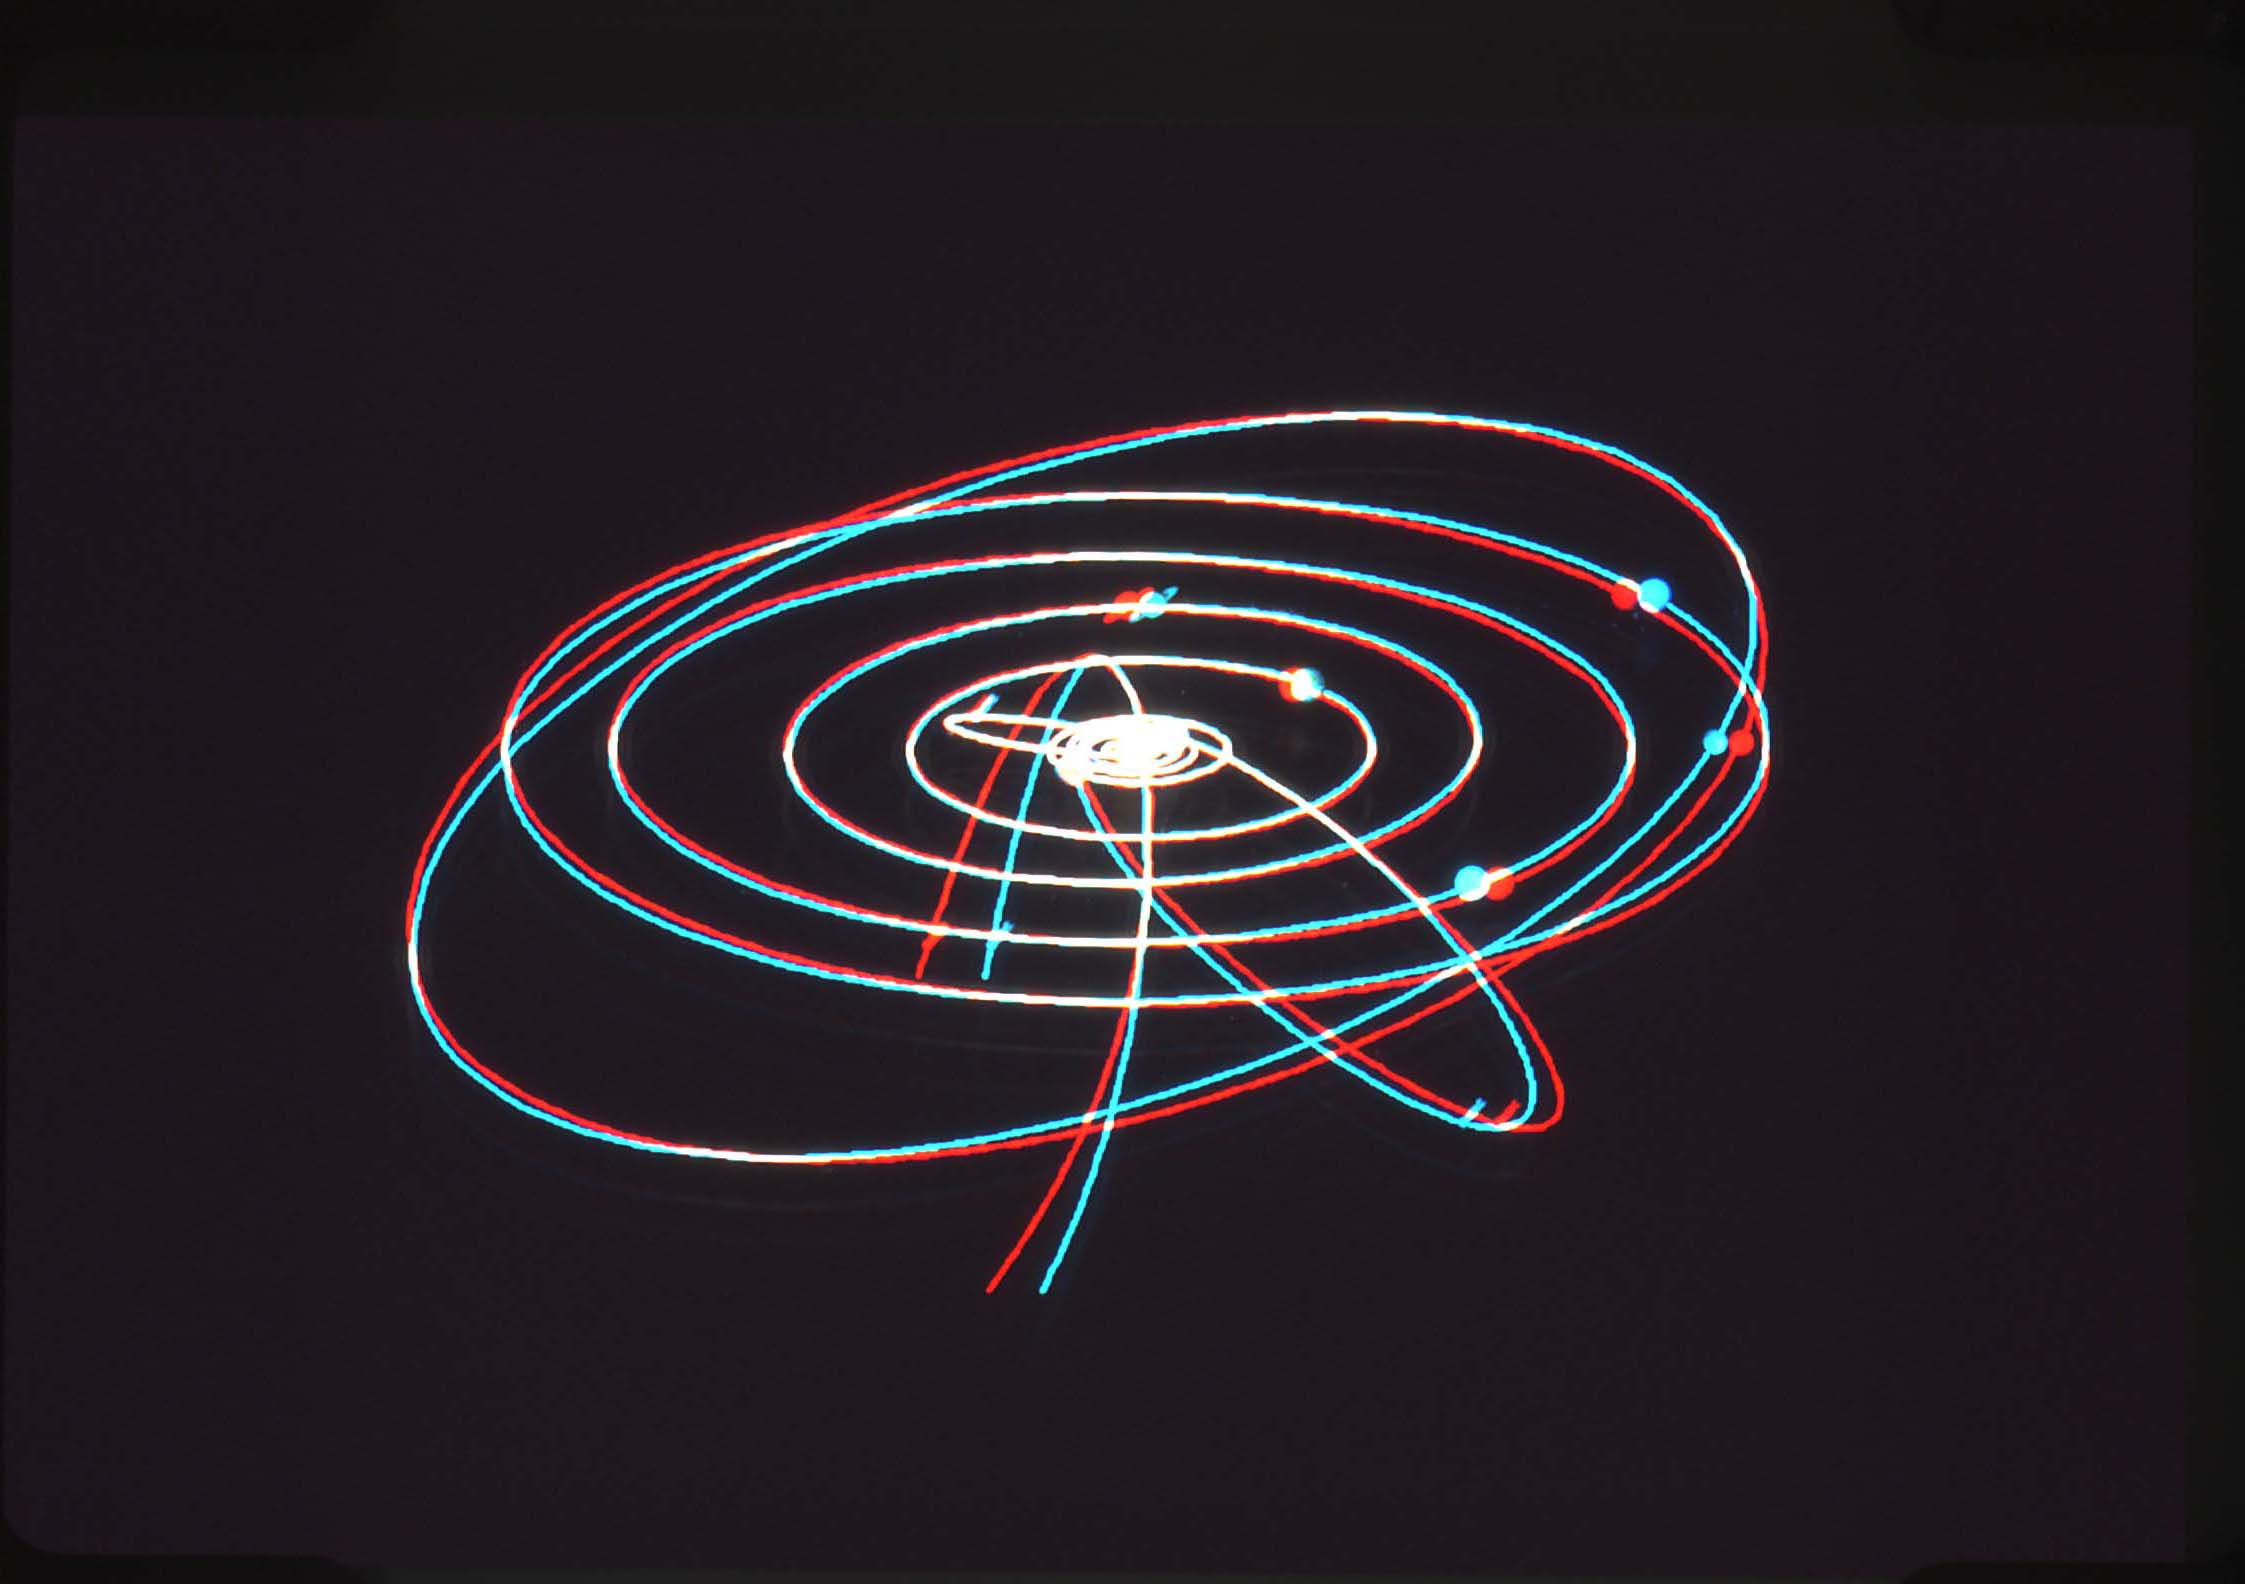 solar system orbits 3d - photo #3